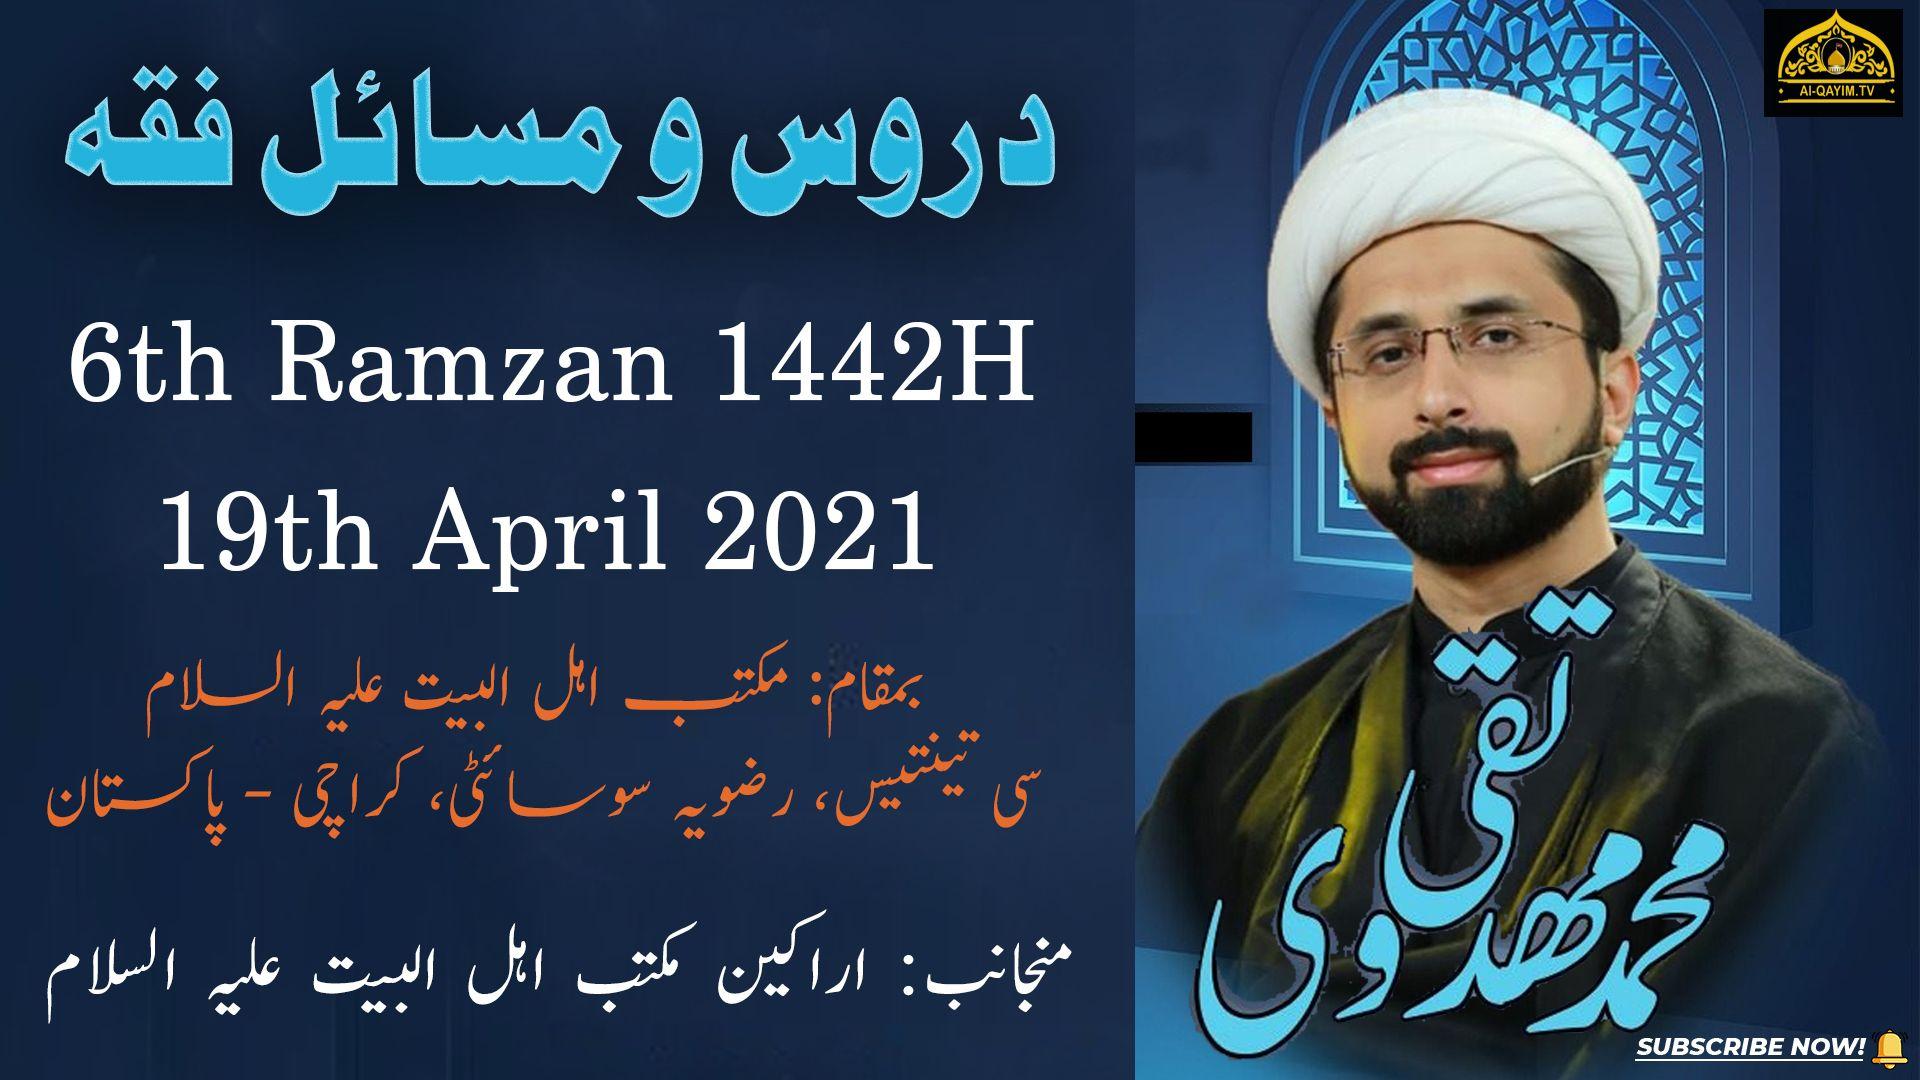 Moulana Muhammad Taqi Mehdavi | Dars Wo Masail Fiqae | 6th Ramzan 2021 | Maktab-e-Ahlebait - Karachi